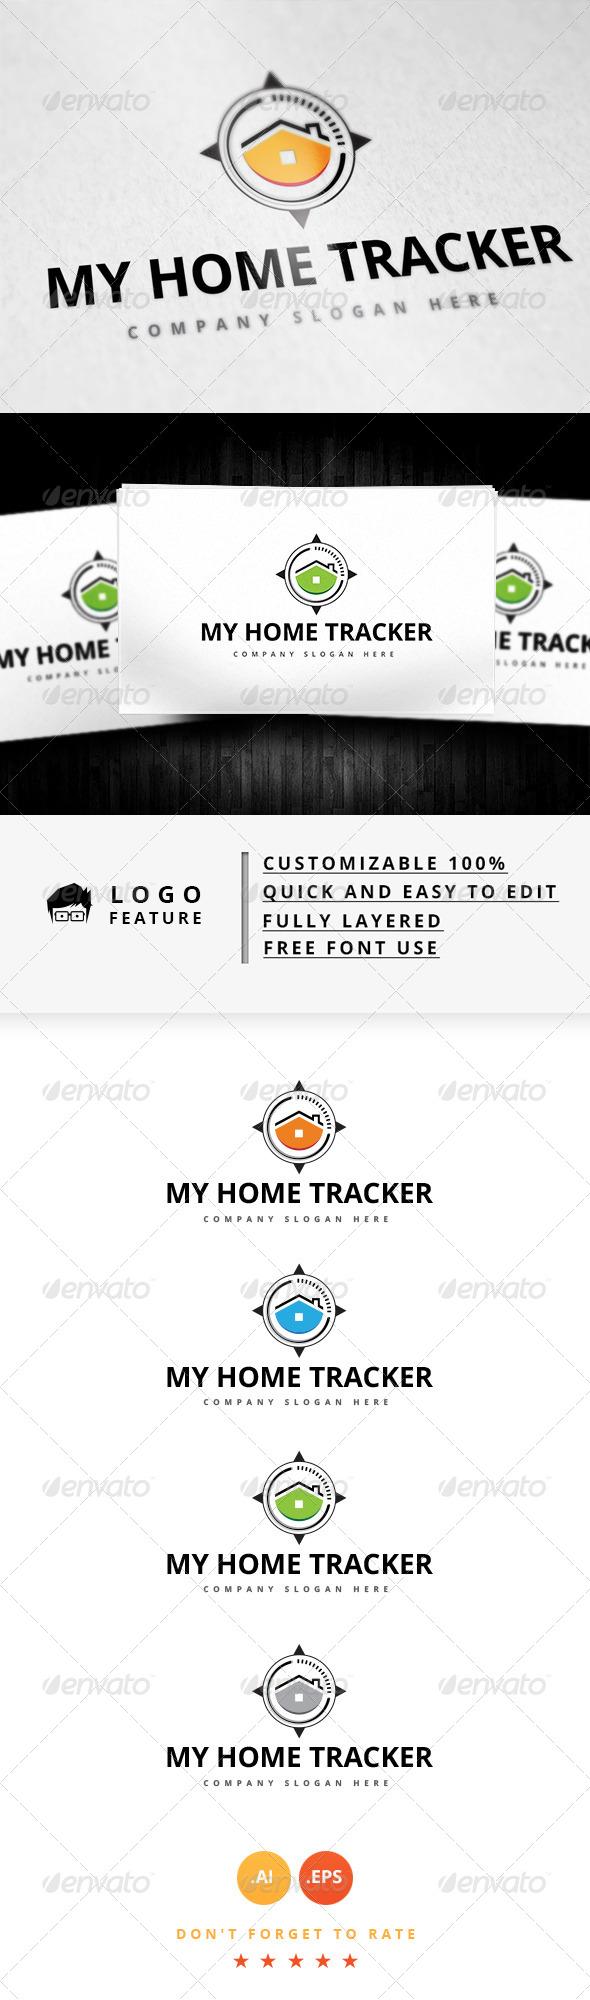 GraphicRiver My Home Tracker Logo 8187936